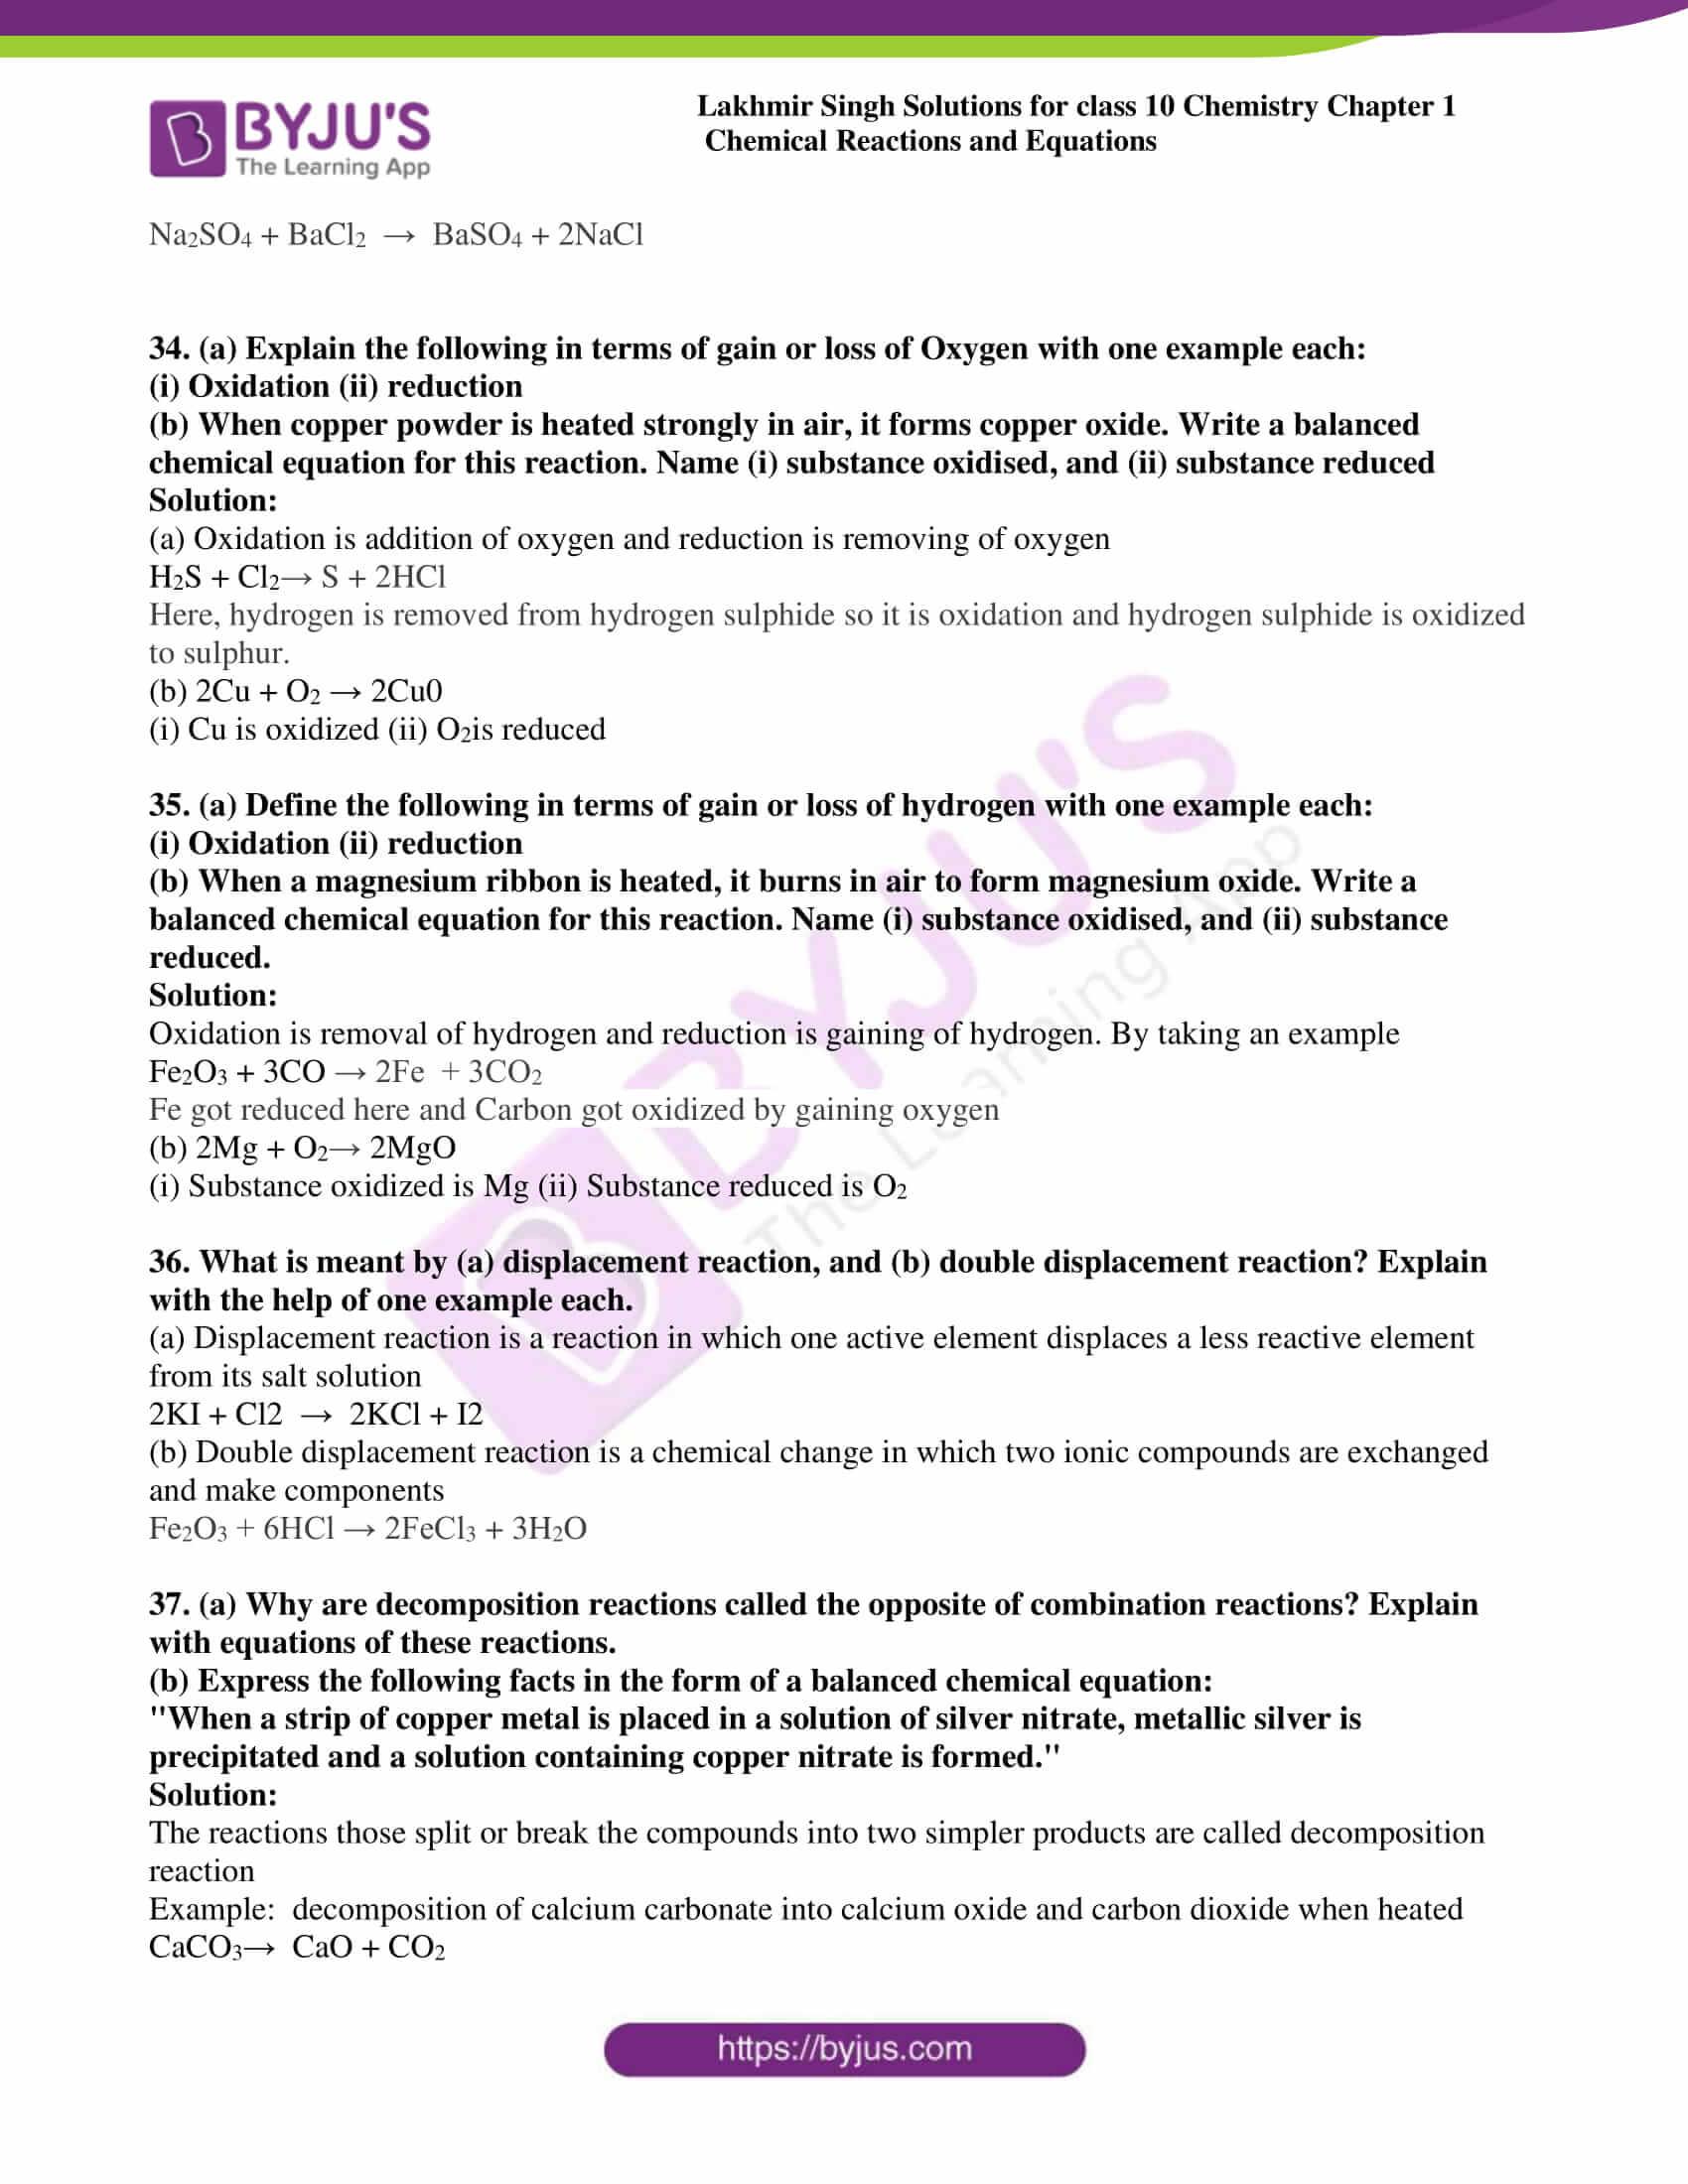 lakhmir singh sol class 10 che chapter 1 23